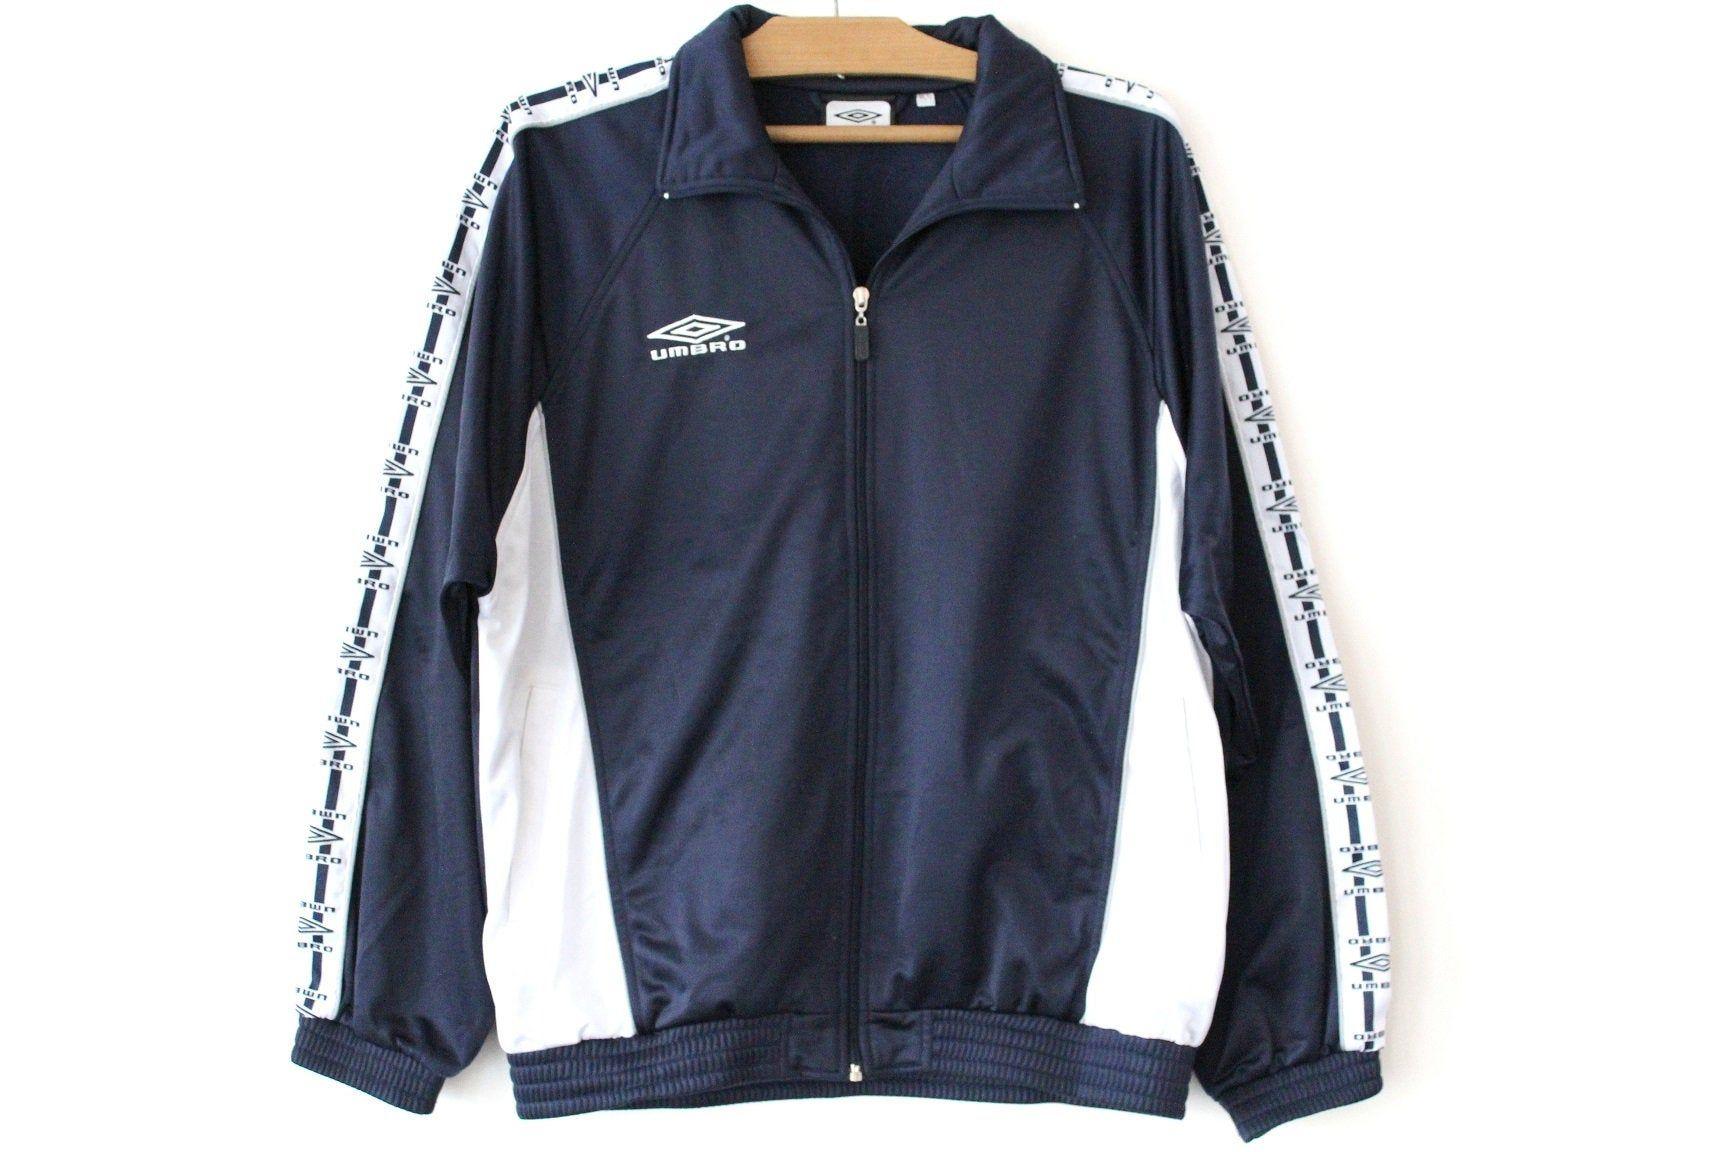 Vintage Blue White Umbro Jacket, 90's Umbro Sweatshirt, Hip